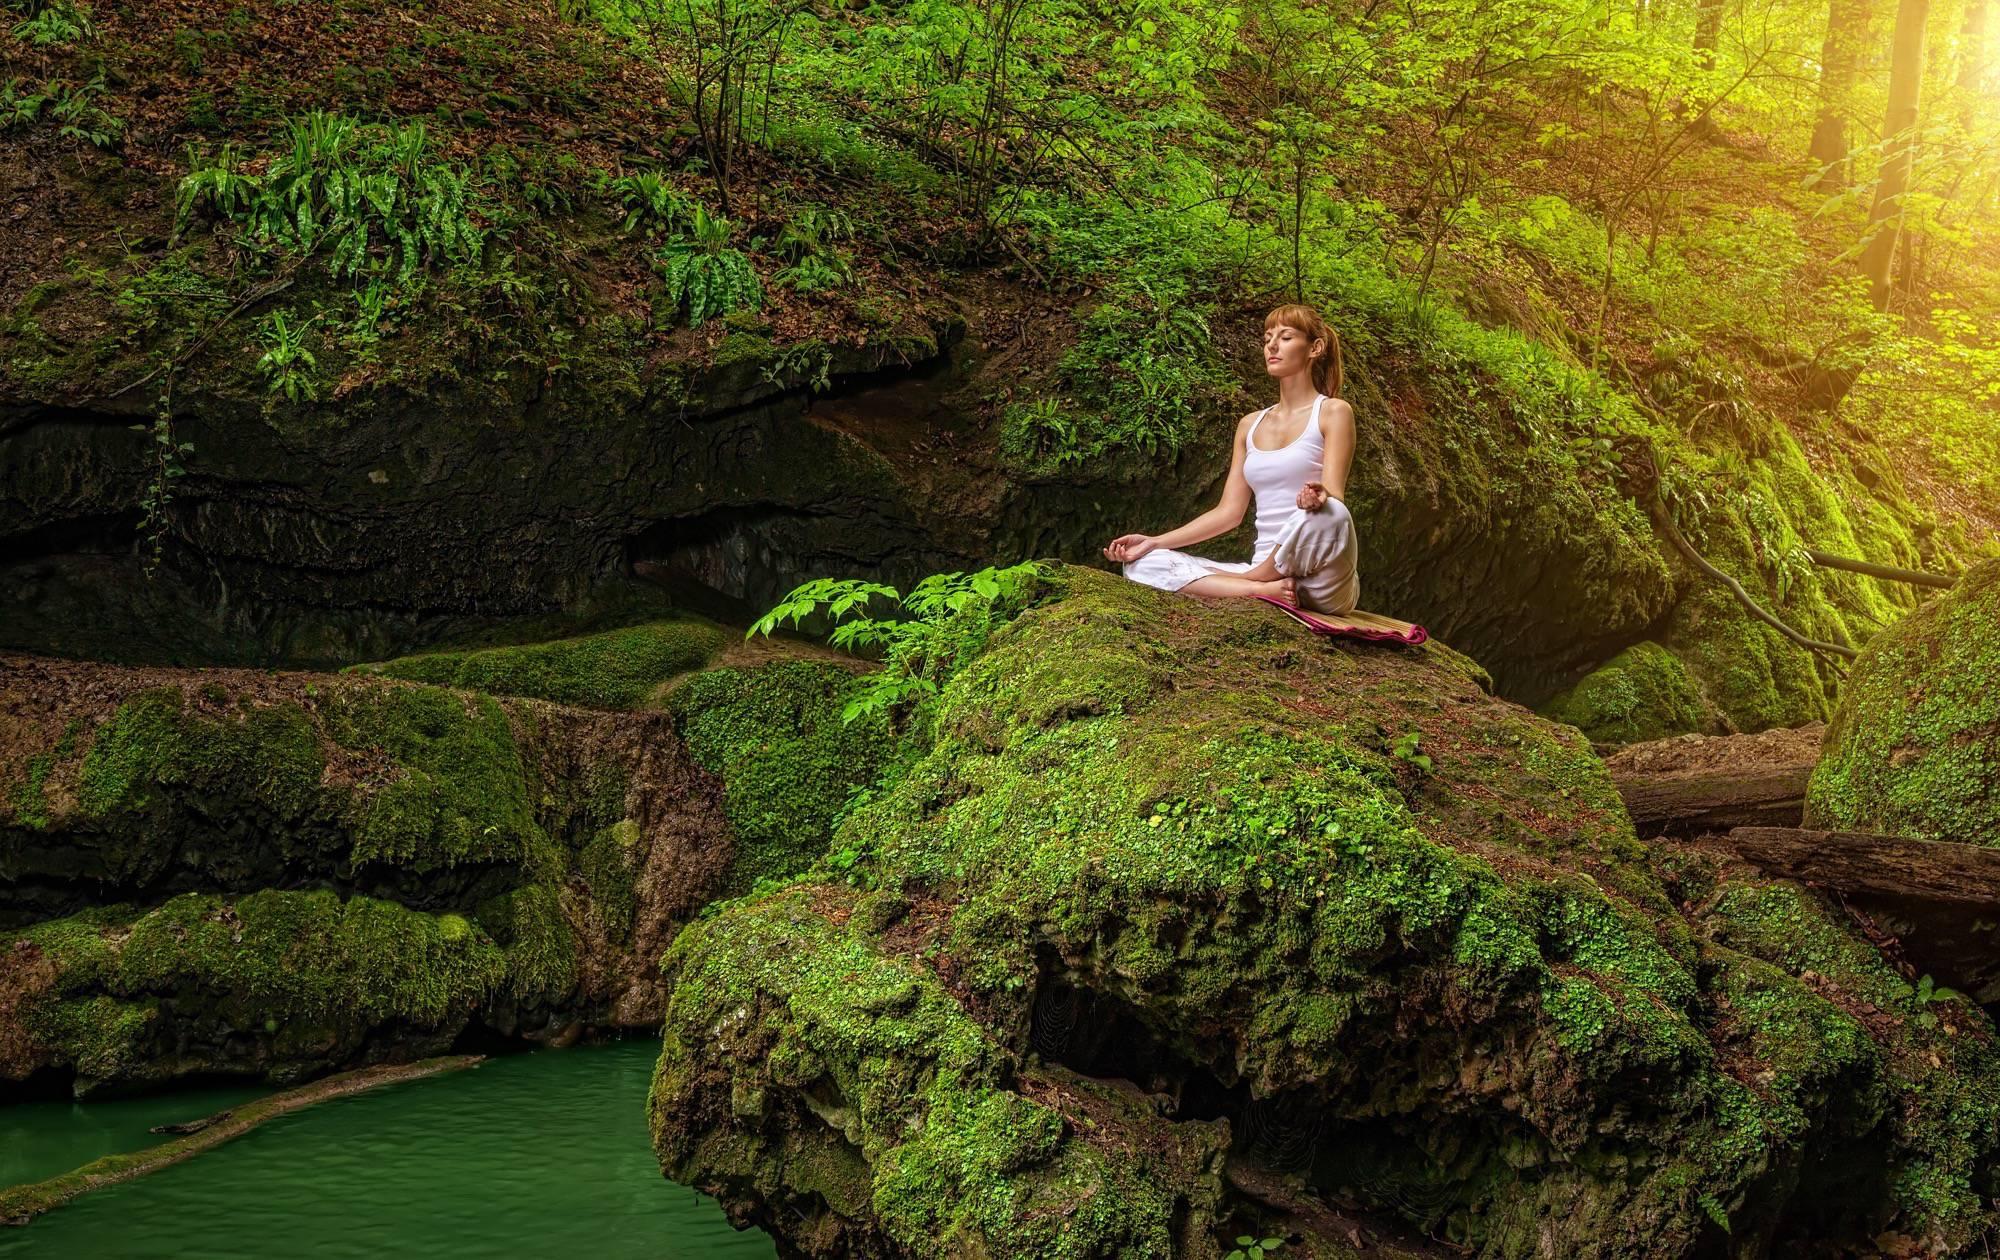 gaya - Alternative de société et conscience pour Gaya. Gaia_meditation_191745938